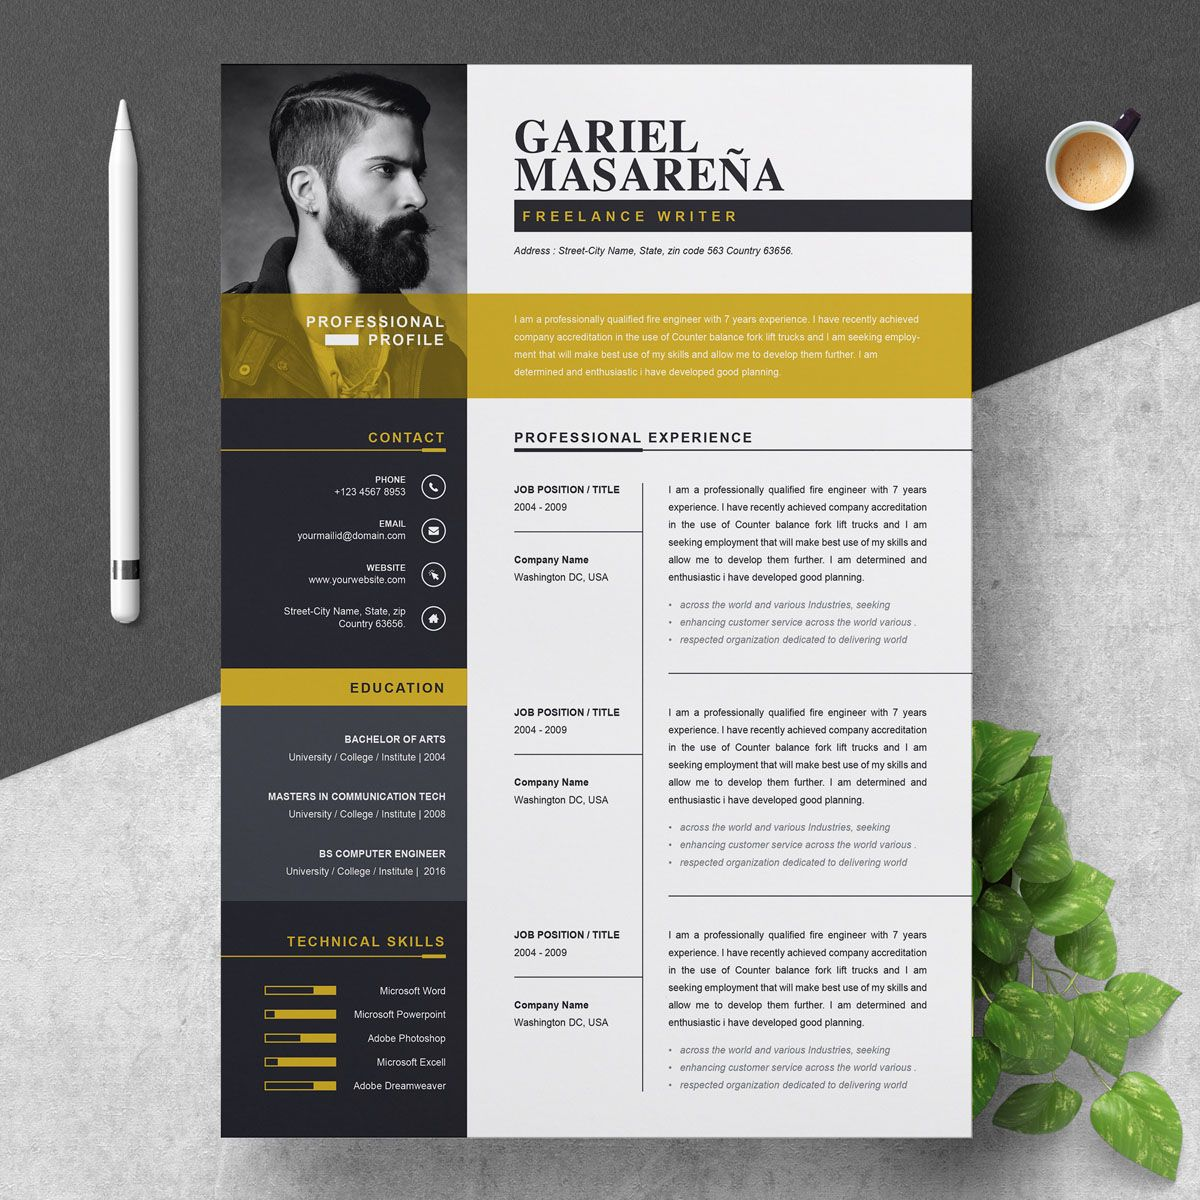 Gariel Masarena Resume Template 76948 Resume design, Cv